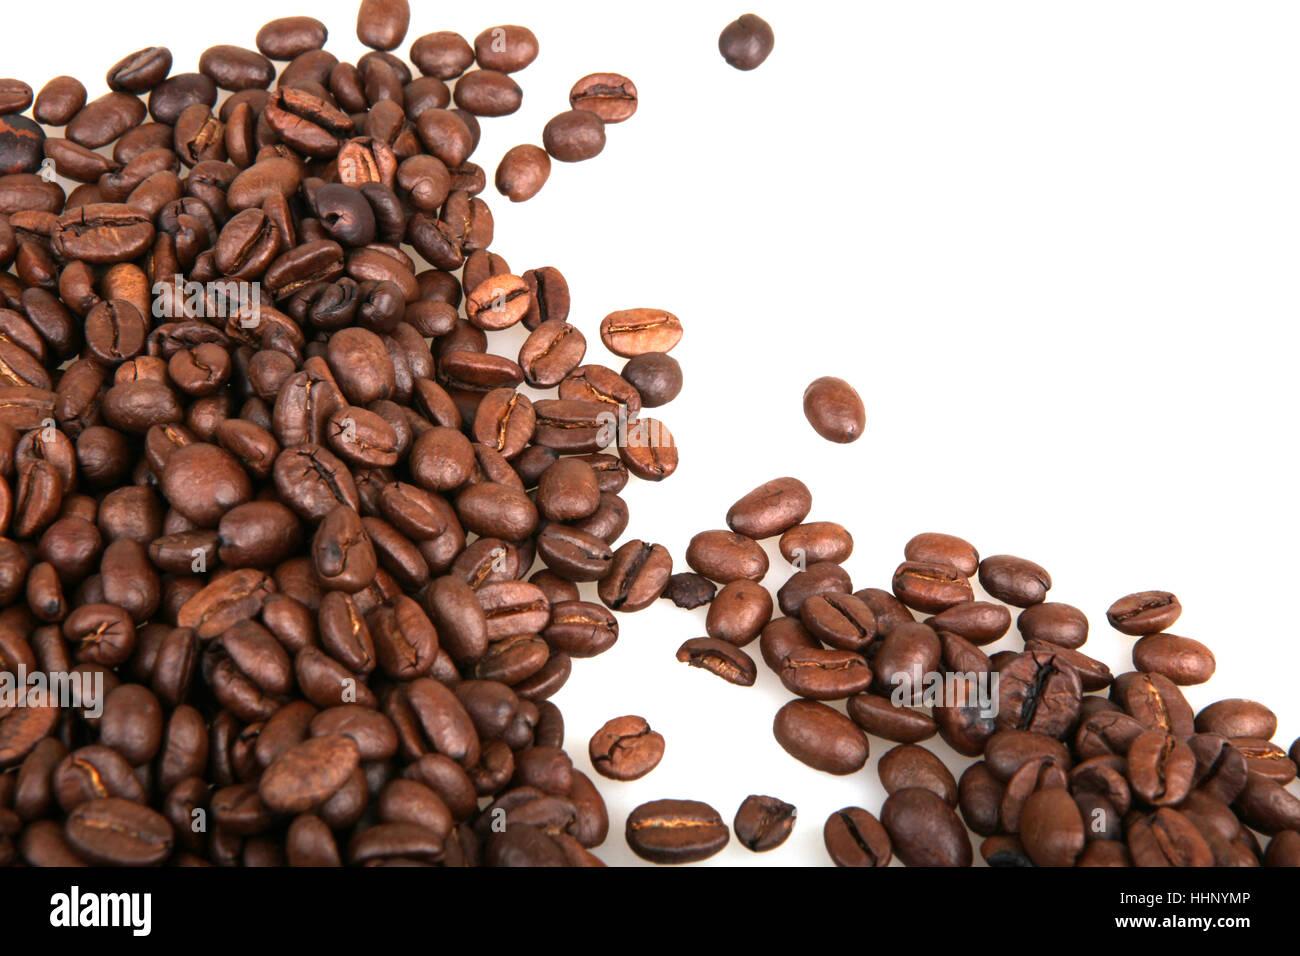 cafe, coffee, coffee bean, caffeine, dessert, chocolate, cafe ...